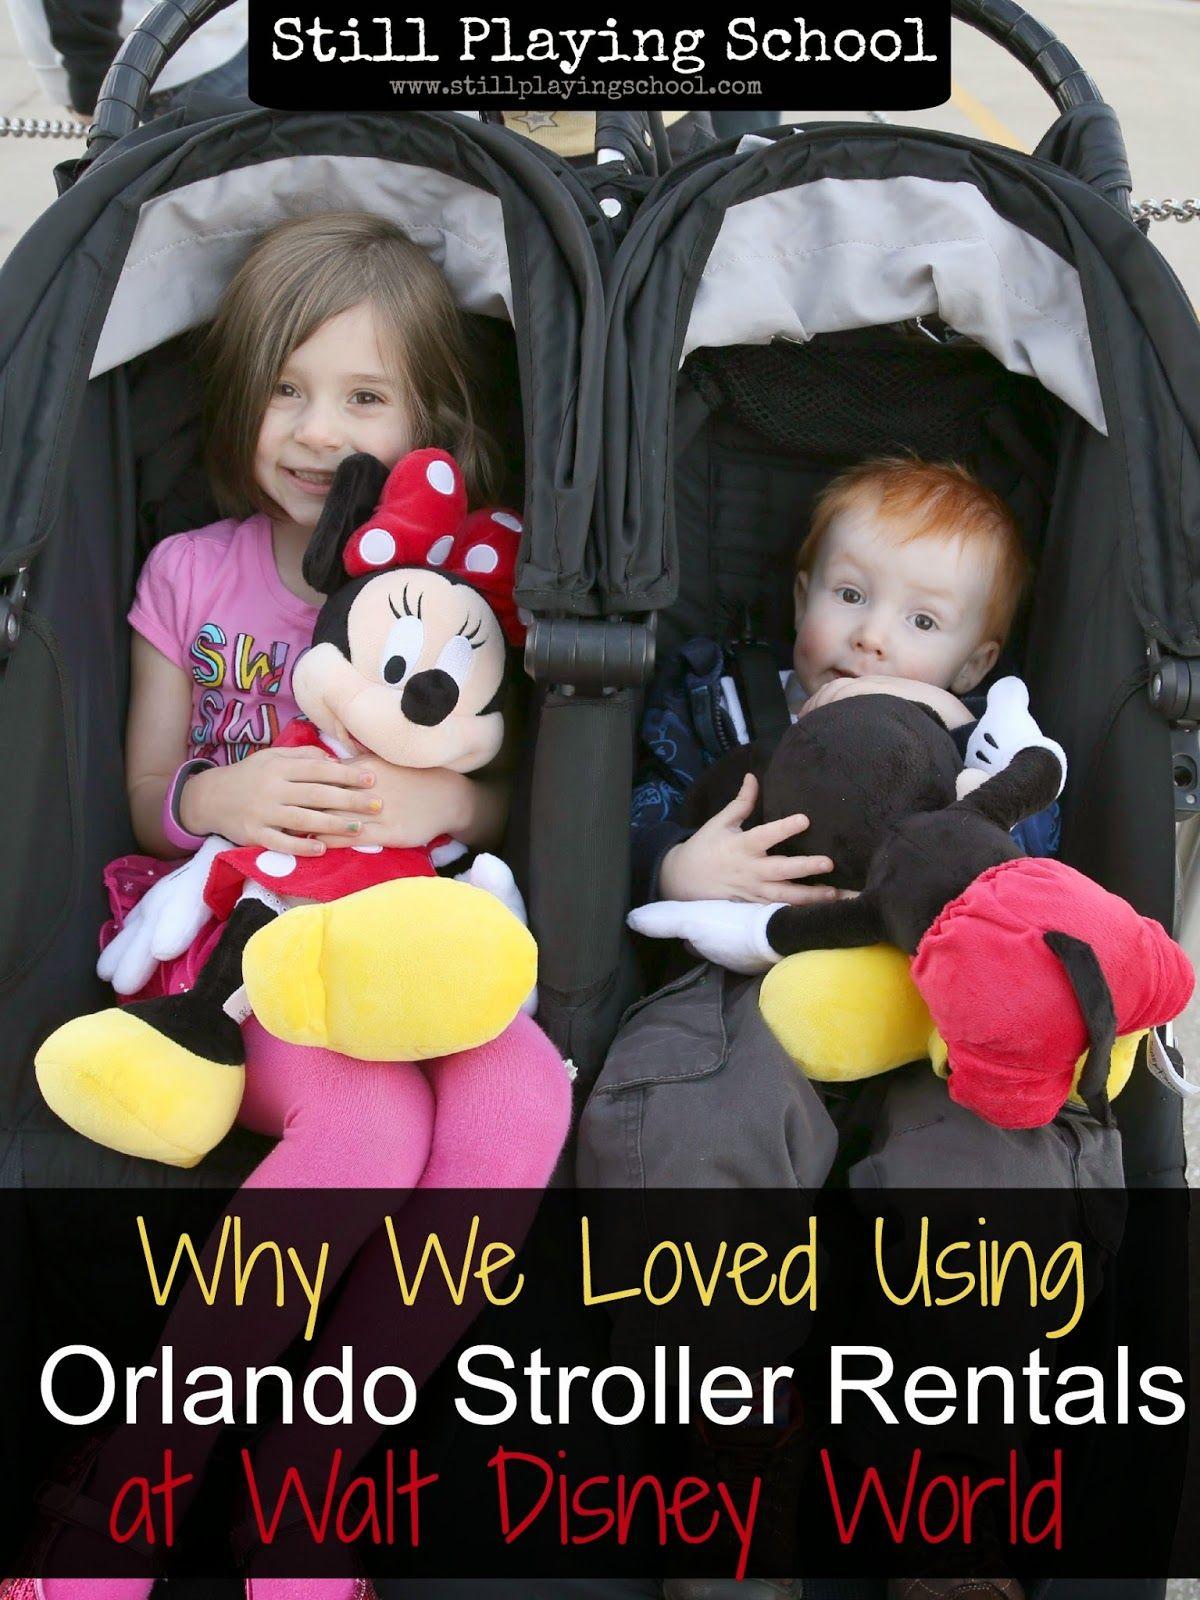 Orlando Stroller Rentals At Walt Disney World From Still Playing School